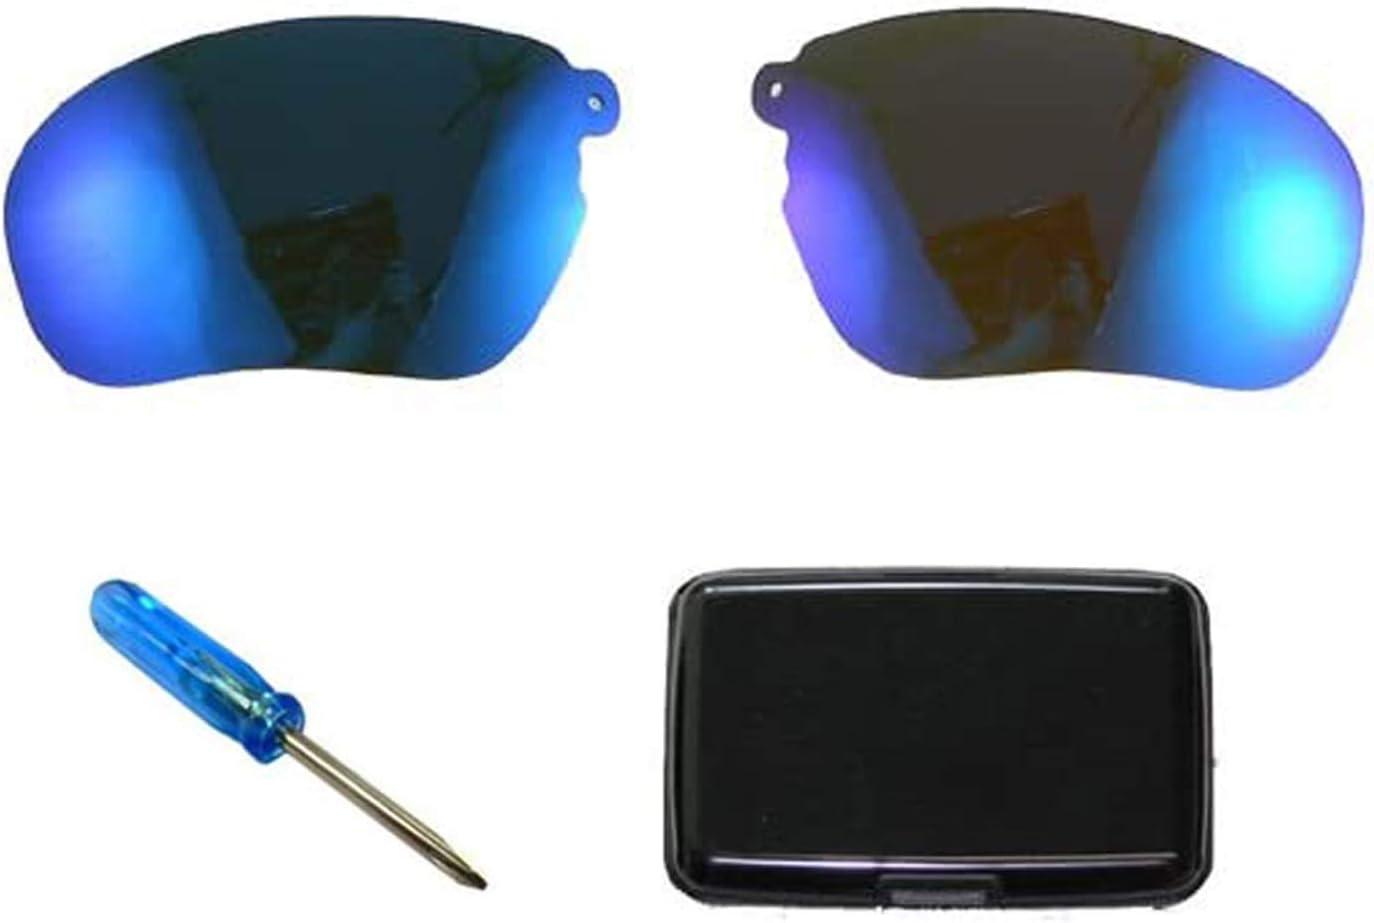 WONFAST 1pcs Replacement Sunglassess Lenses Lens for Wireless Bluetooth Sunglasses Headset Headphones + 1pcs Aluminum Credit Card Holder Wallet Case for Men & Women(Random Color) (Pair Lens-Blue)